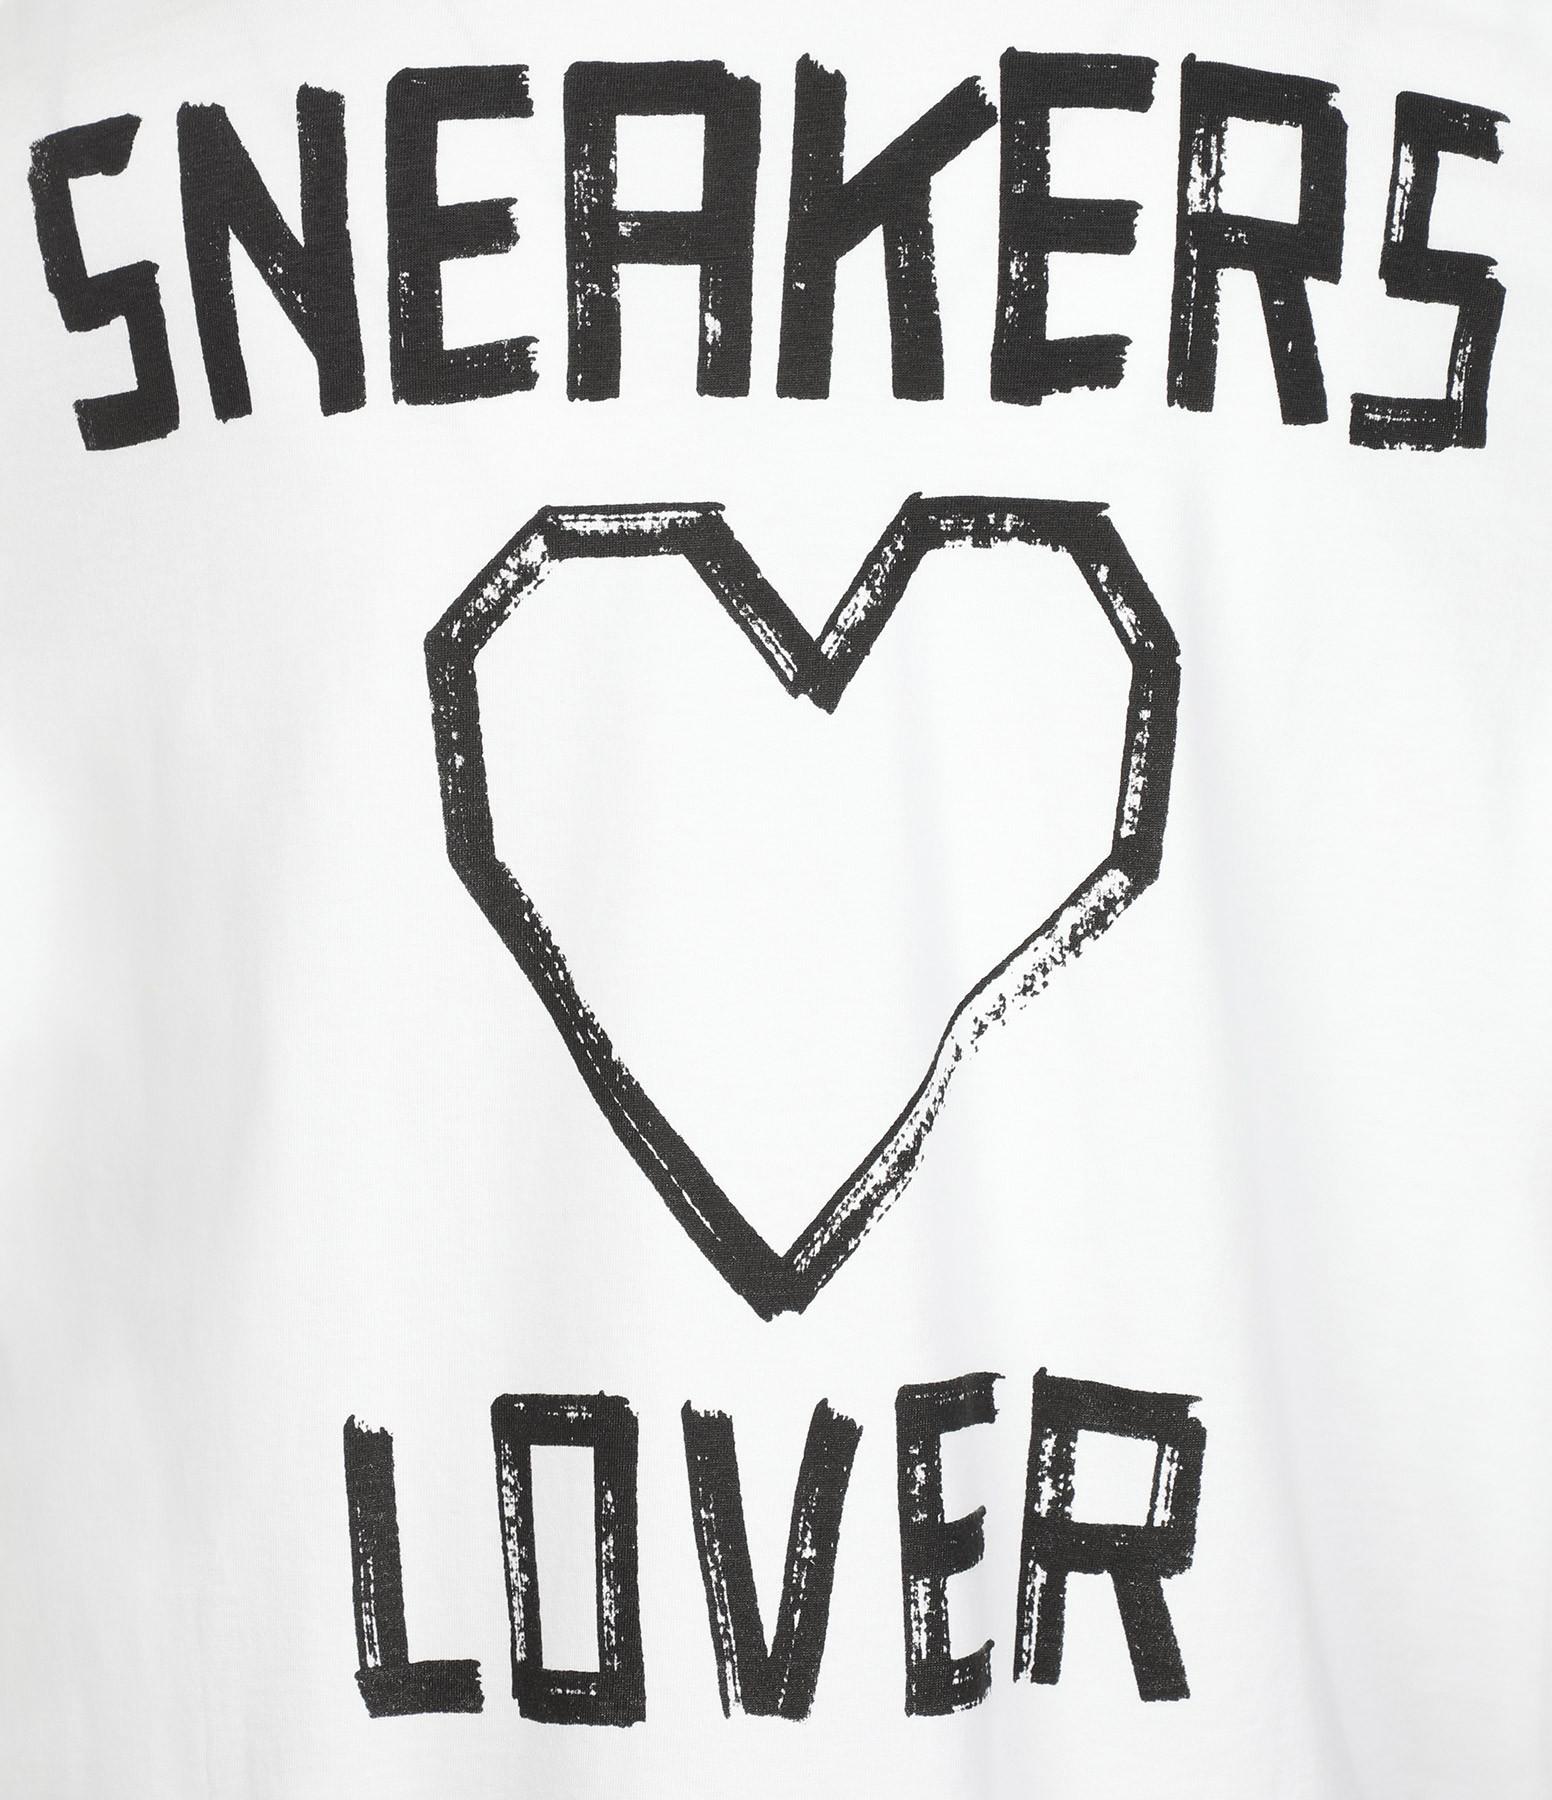 GOLDEN GOOSE - Tee-shirt Over Sneakers Love Coton Blanc